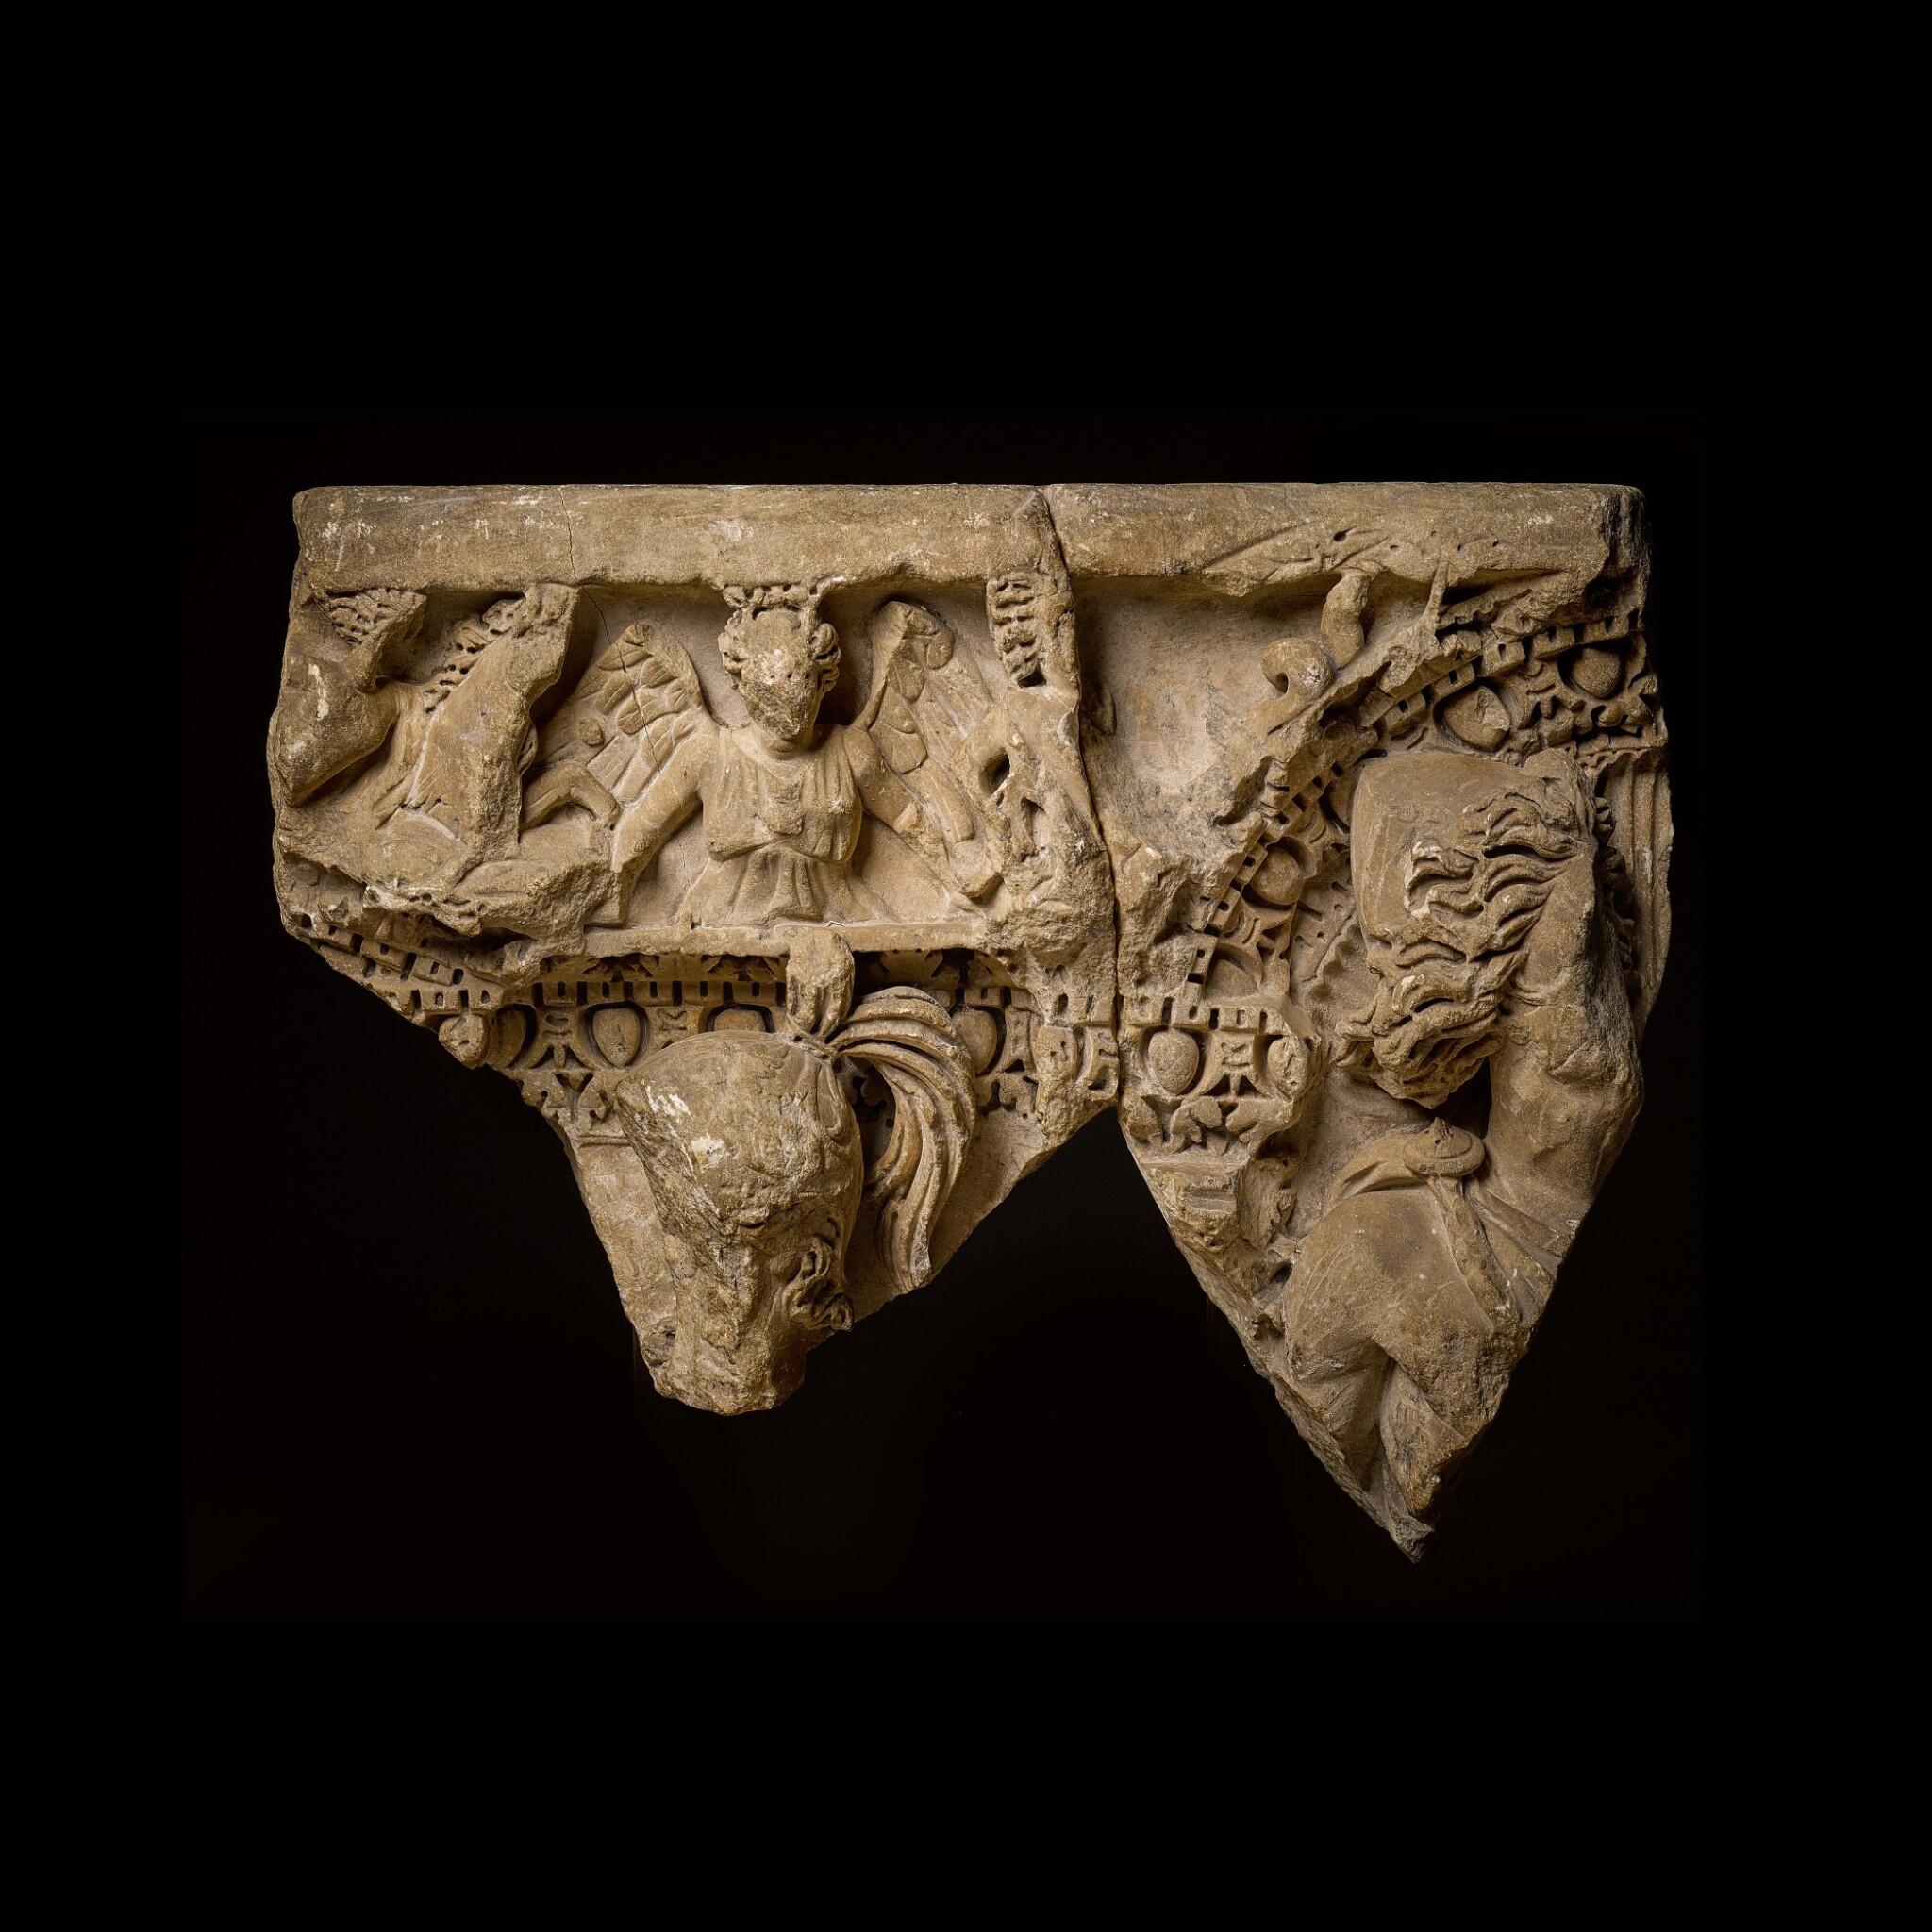 View 1 of Lot 84. A Roman Marble Column Sarcophagus Fragment, Asia Minor, circa A.D. 250-260.